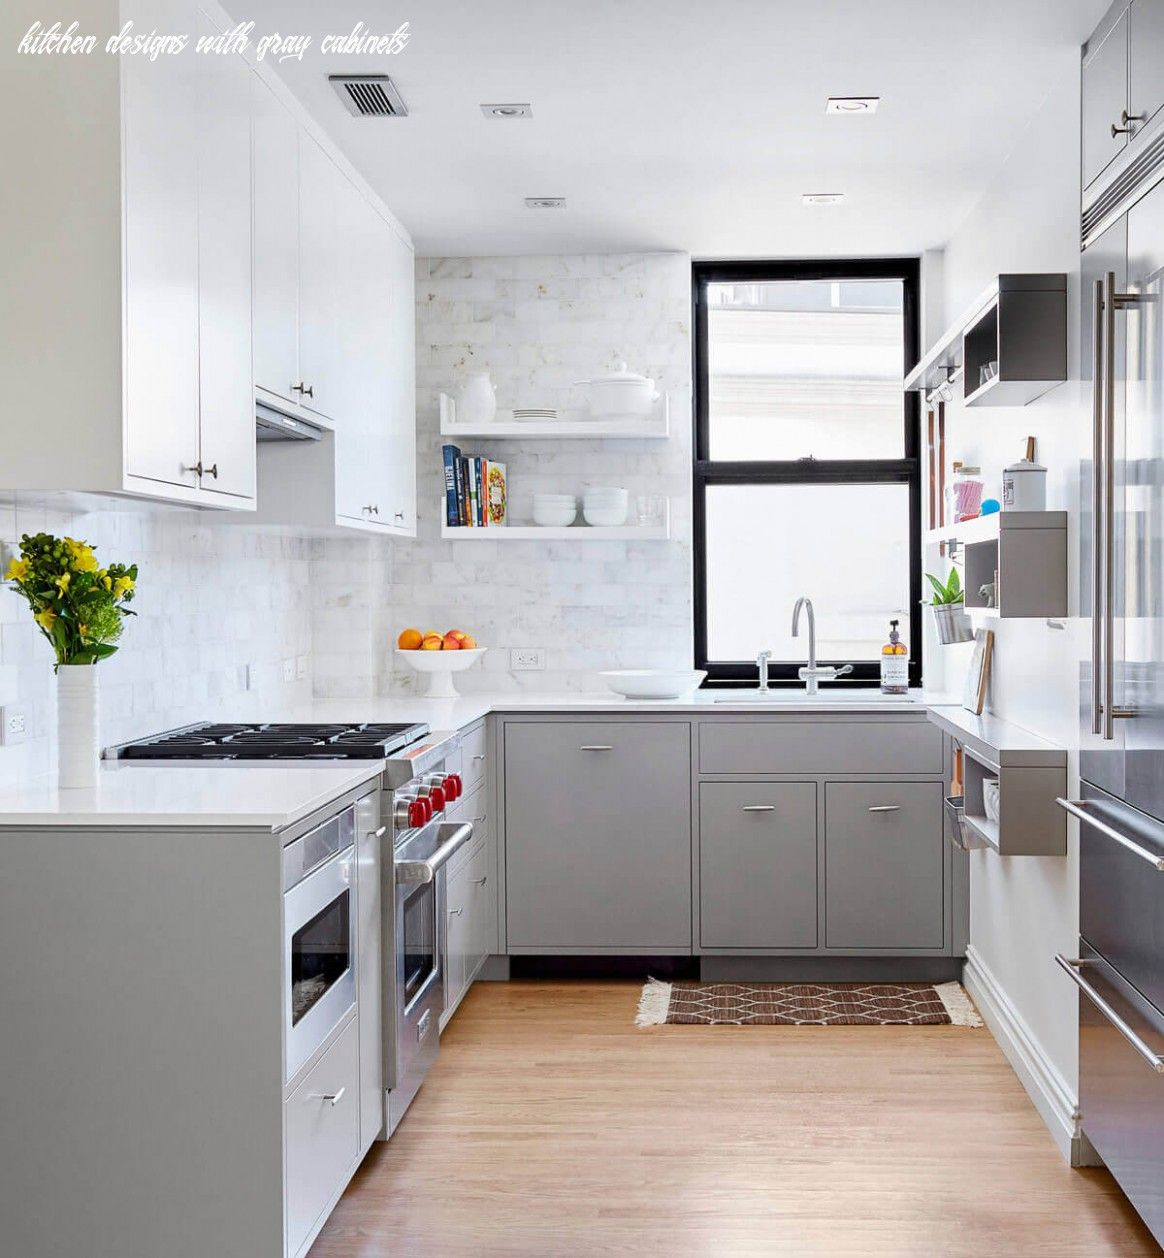 Kitchen Kompact S Glenwood Beech Cabinetry Flat Panel Cabinets Kitchen Dad S Kitchen